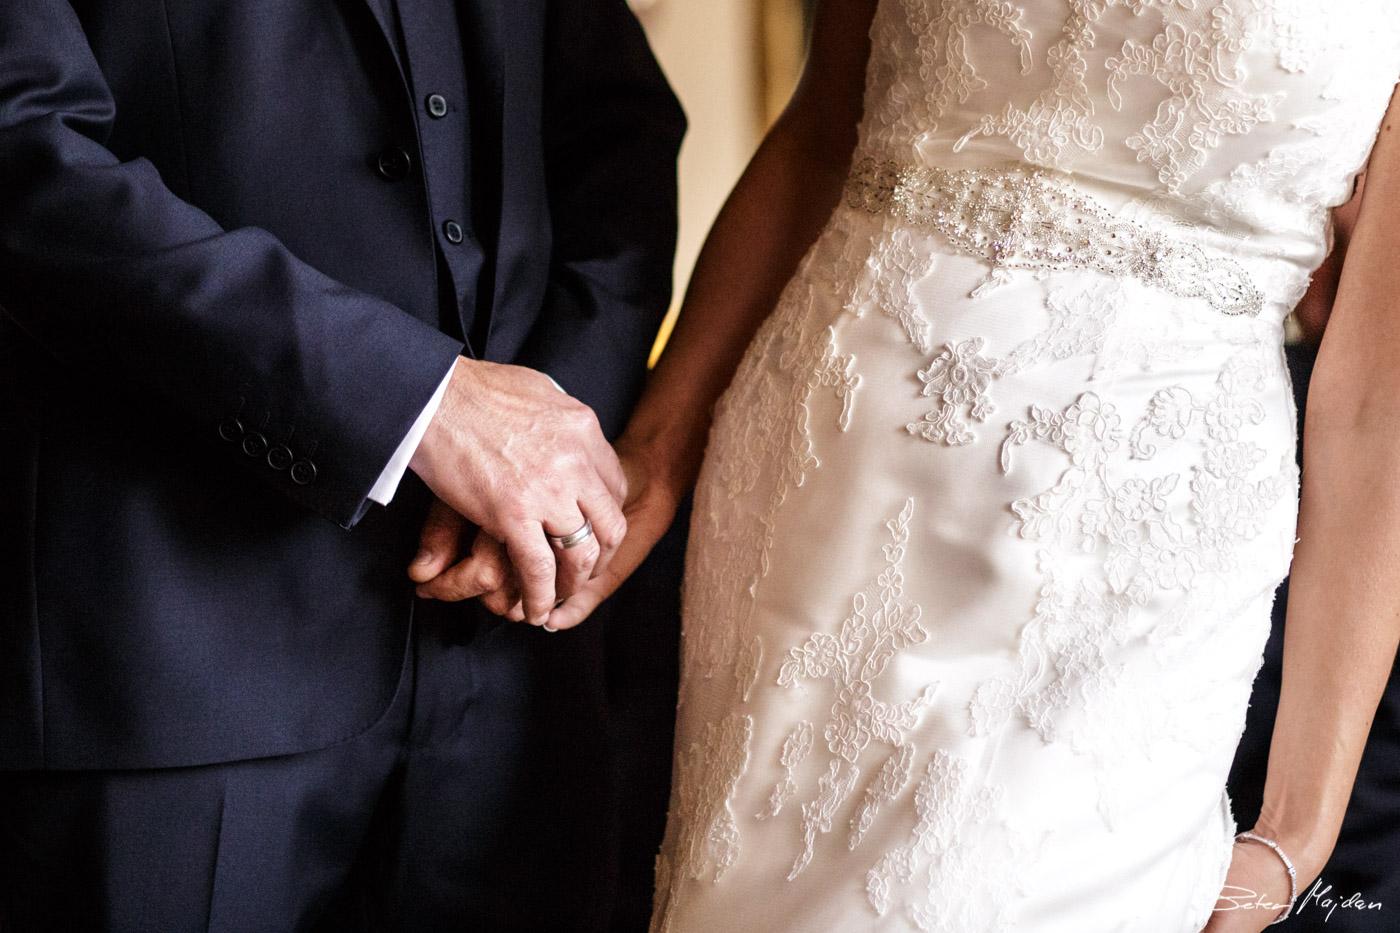 east-bridgford-hill-wedding-photography-26.jpg